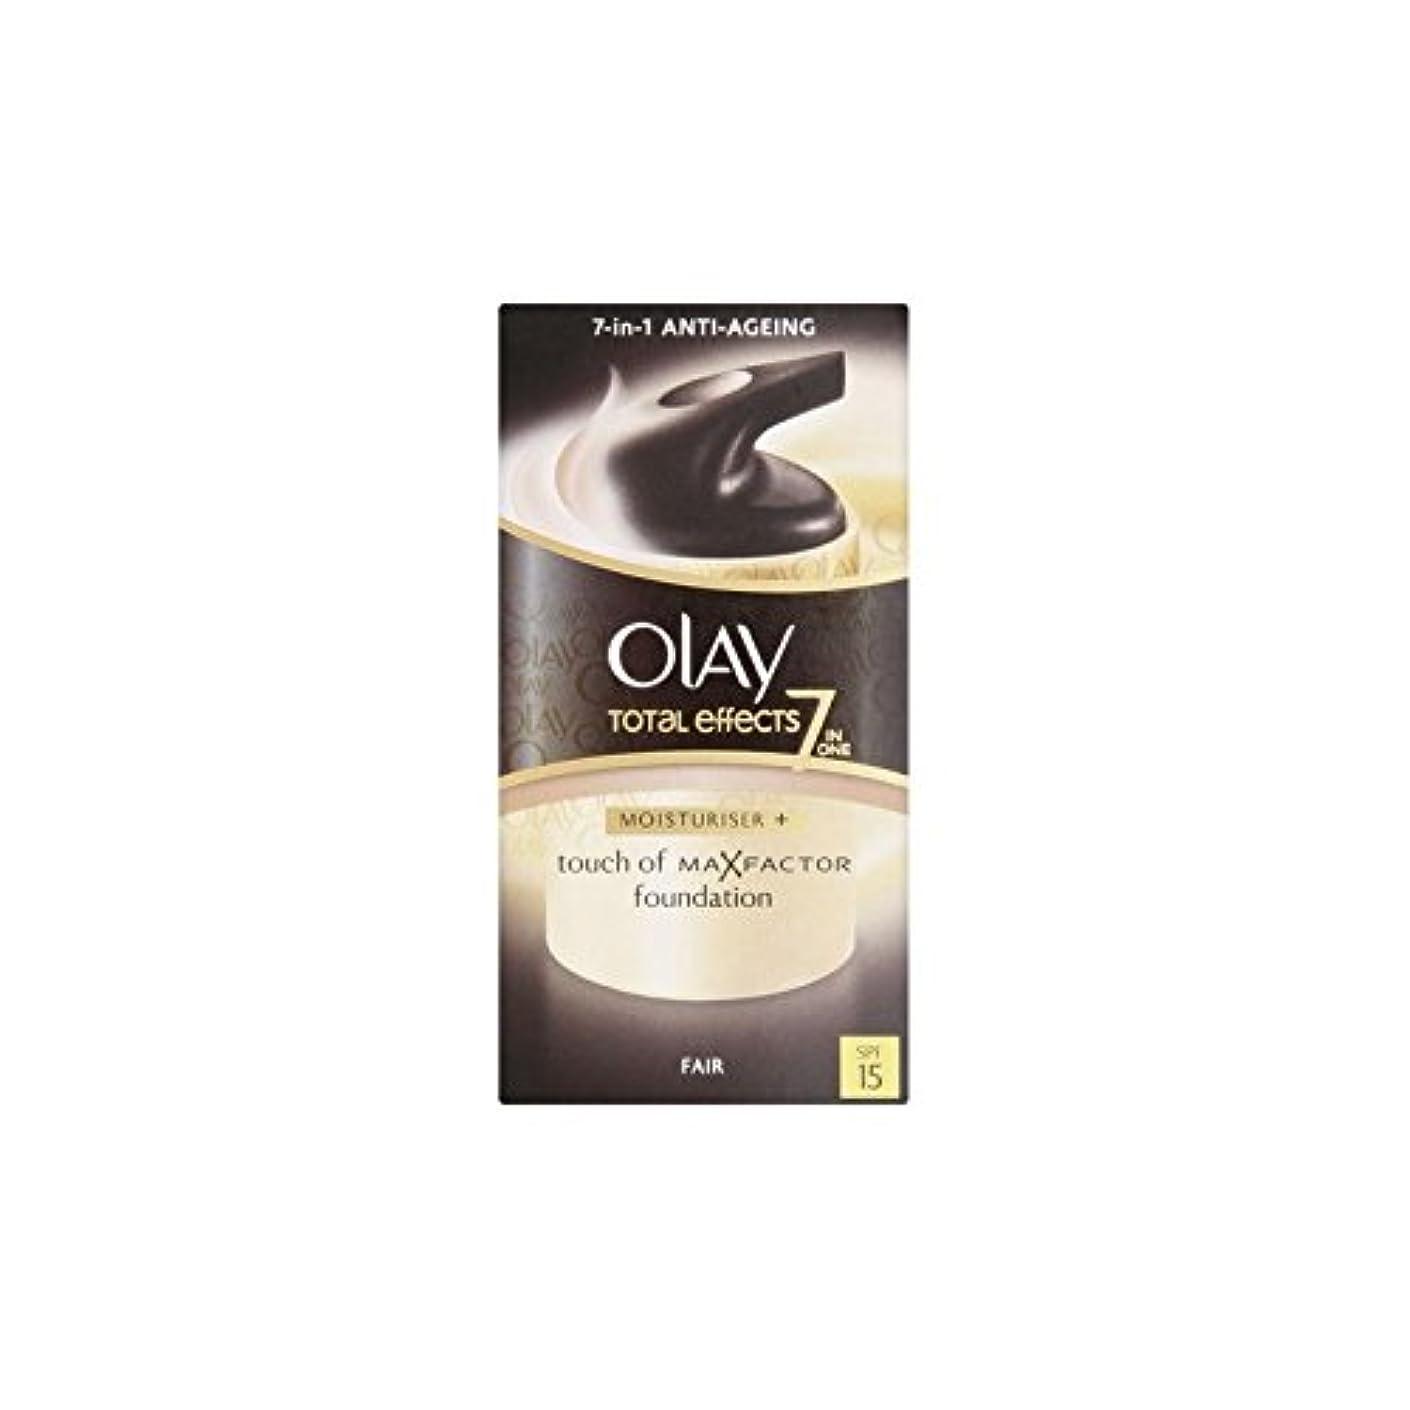 Olay Total Effects Moisturiser Bb Cream Spf15 - Fair (50ml) (Pack of 6) - オーレイトータルエフェクト保湿クリーム15 - フェア(50ミリリットル...